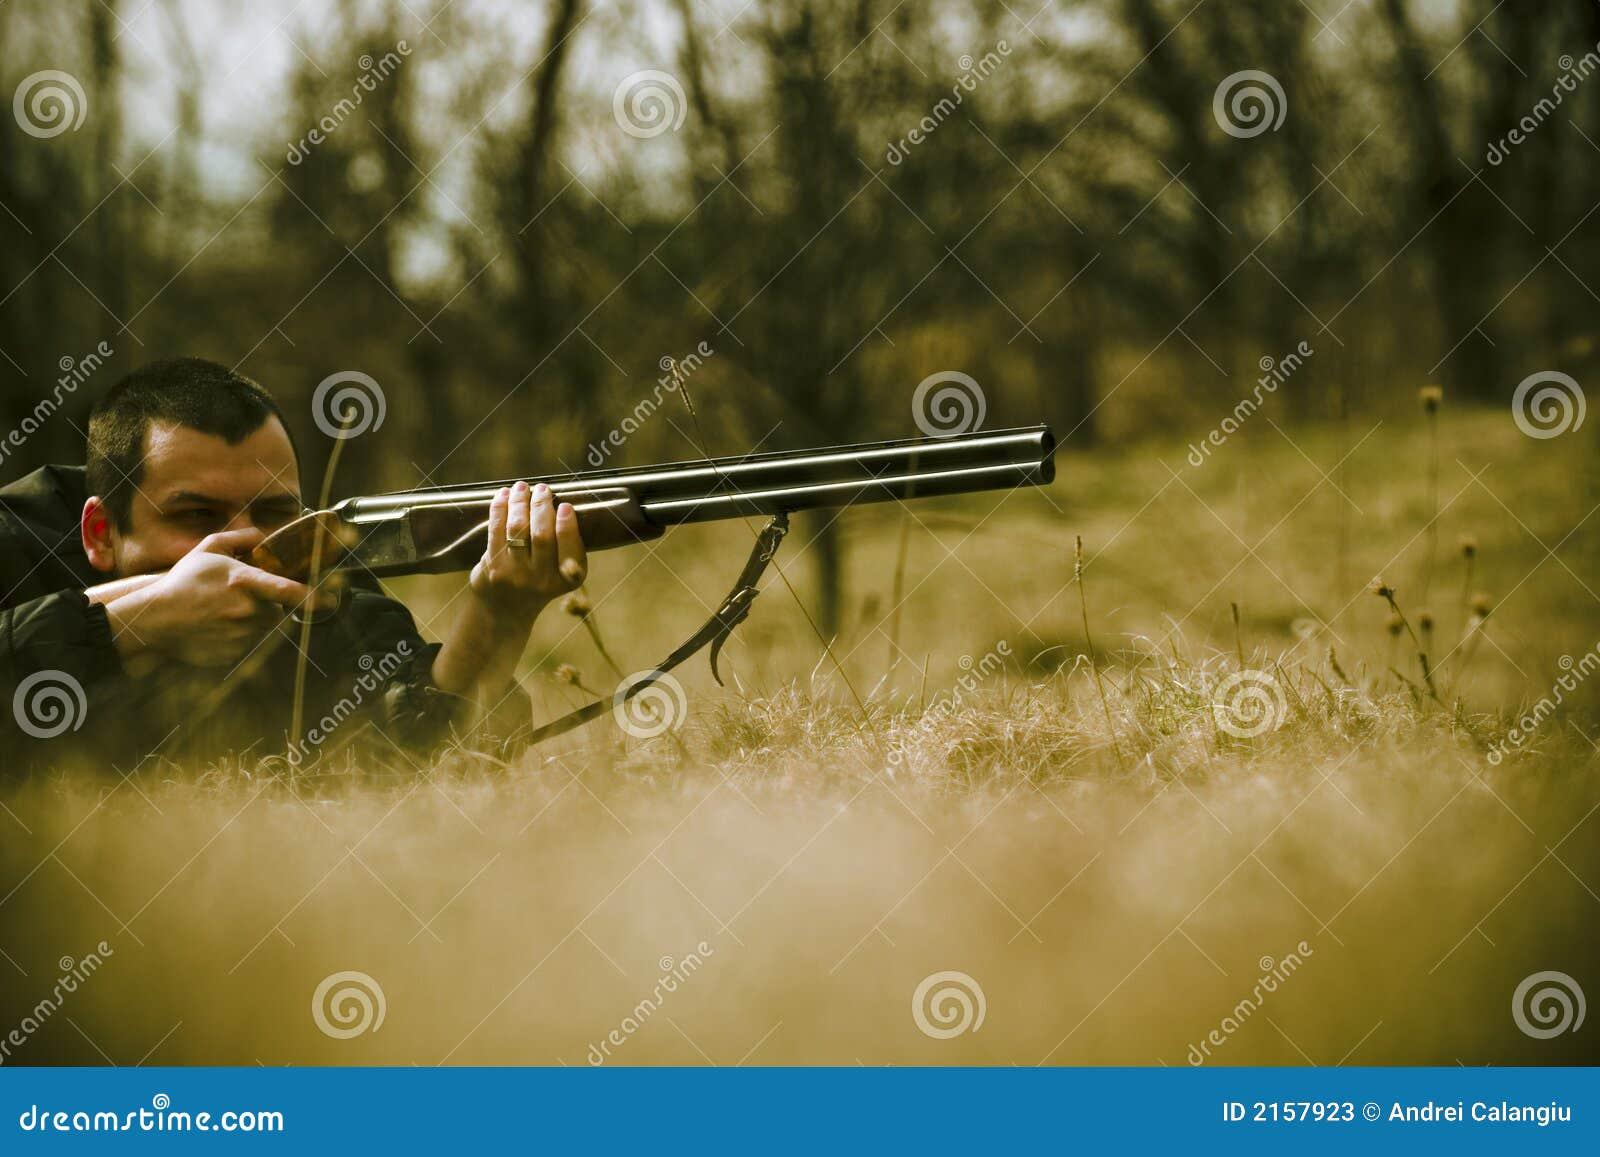 Hunter Aiming Shotgun Stock Photos - Image: 2157923